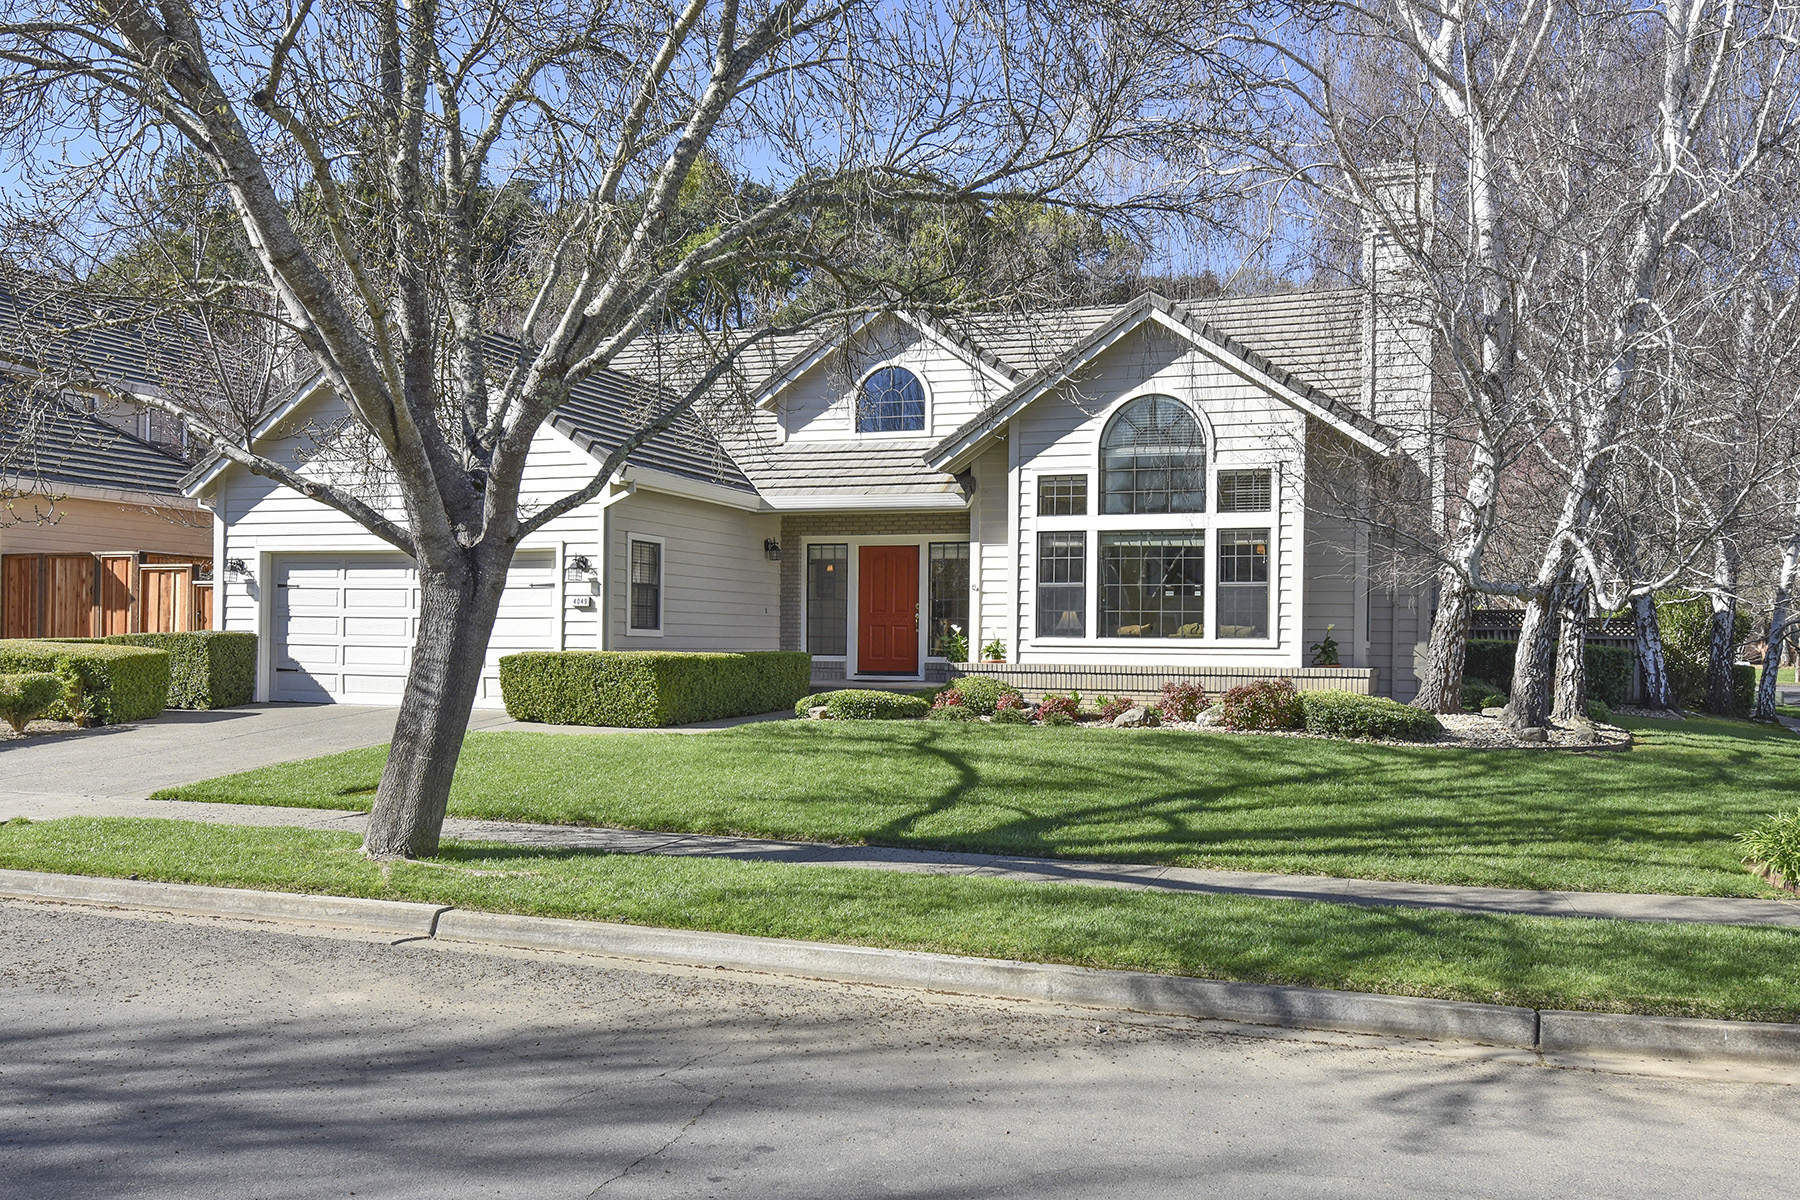 sales property at 4049 Foxridge Way, Napa, CA 94558